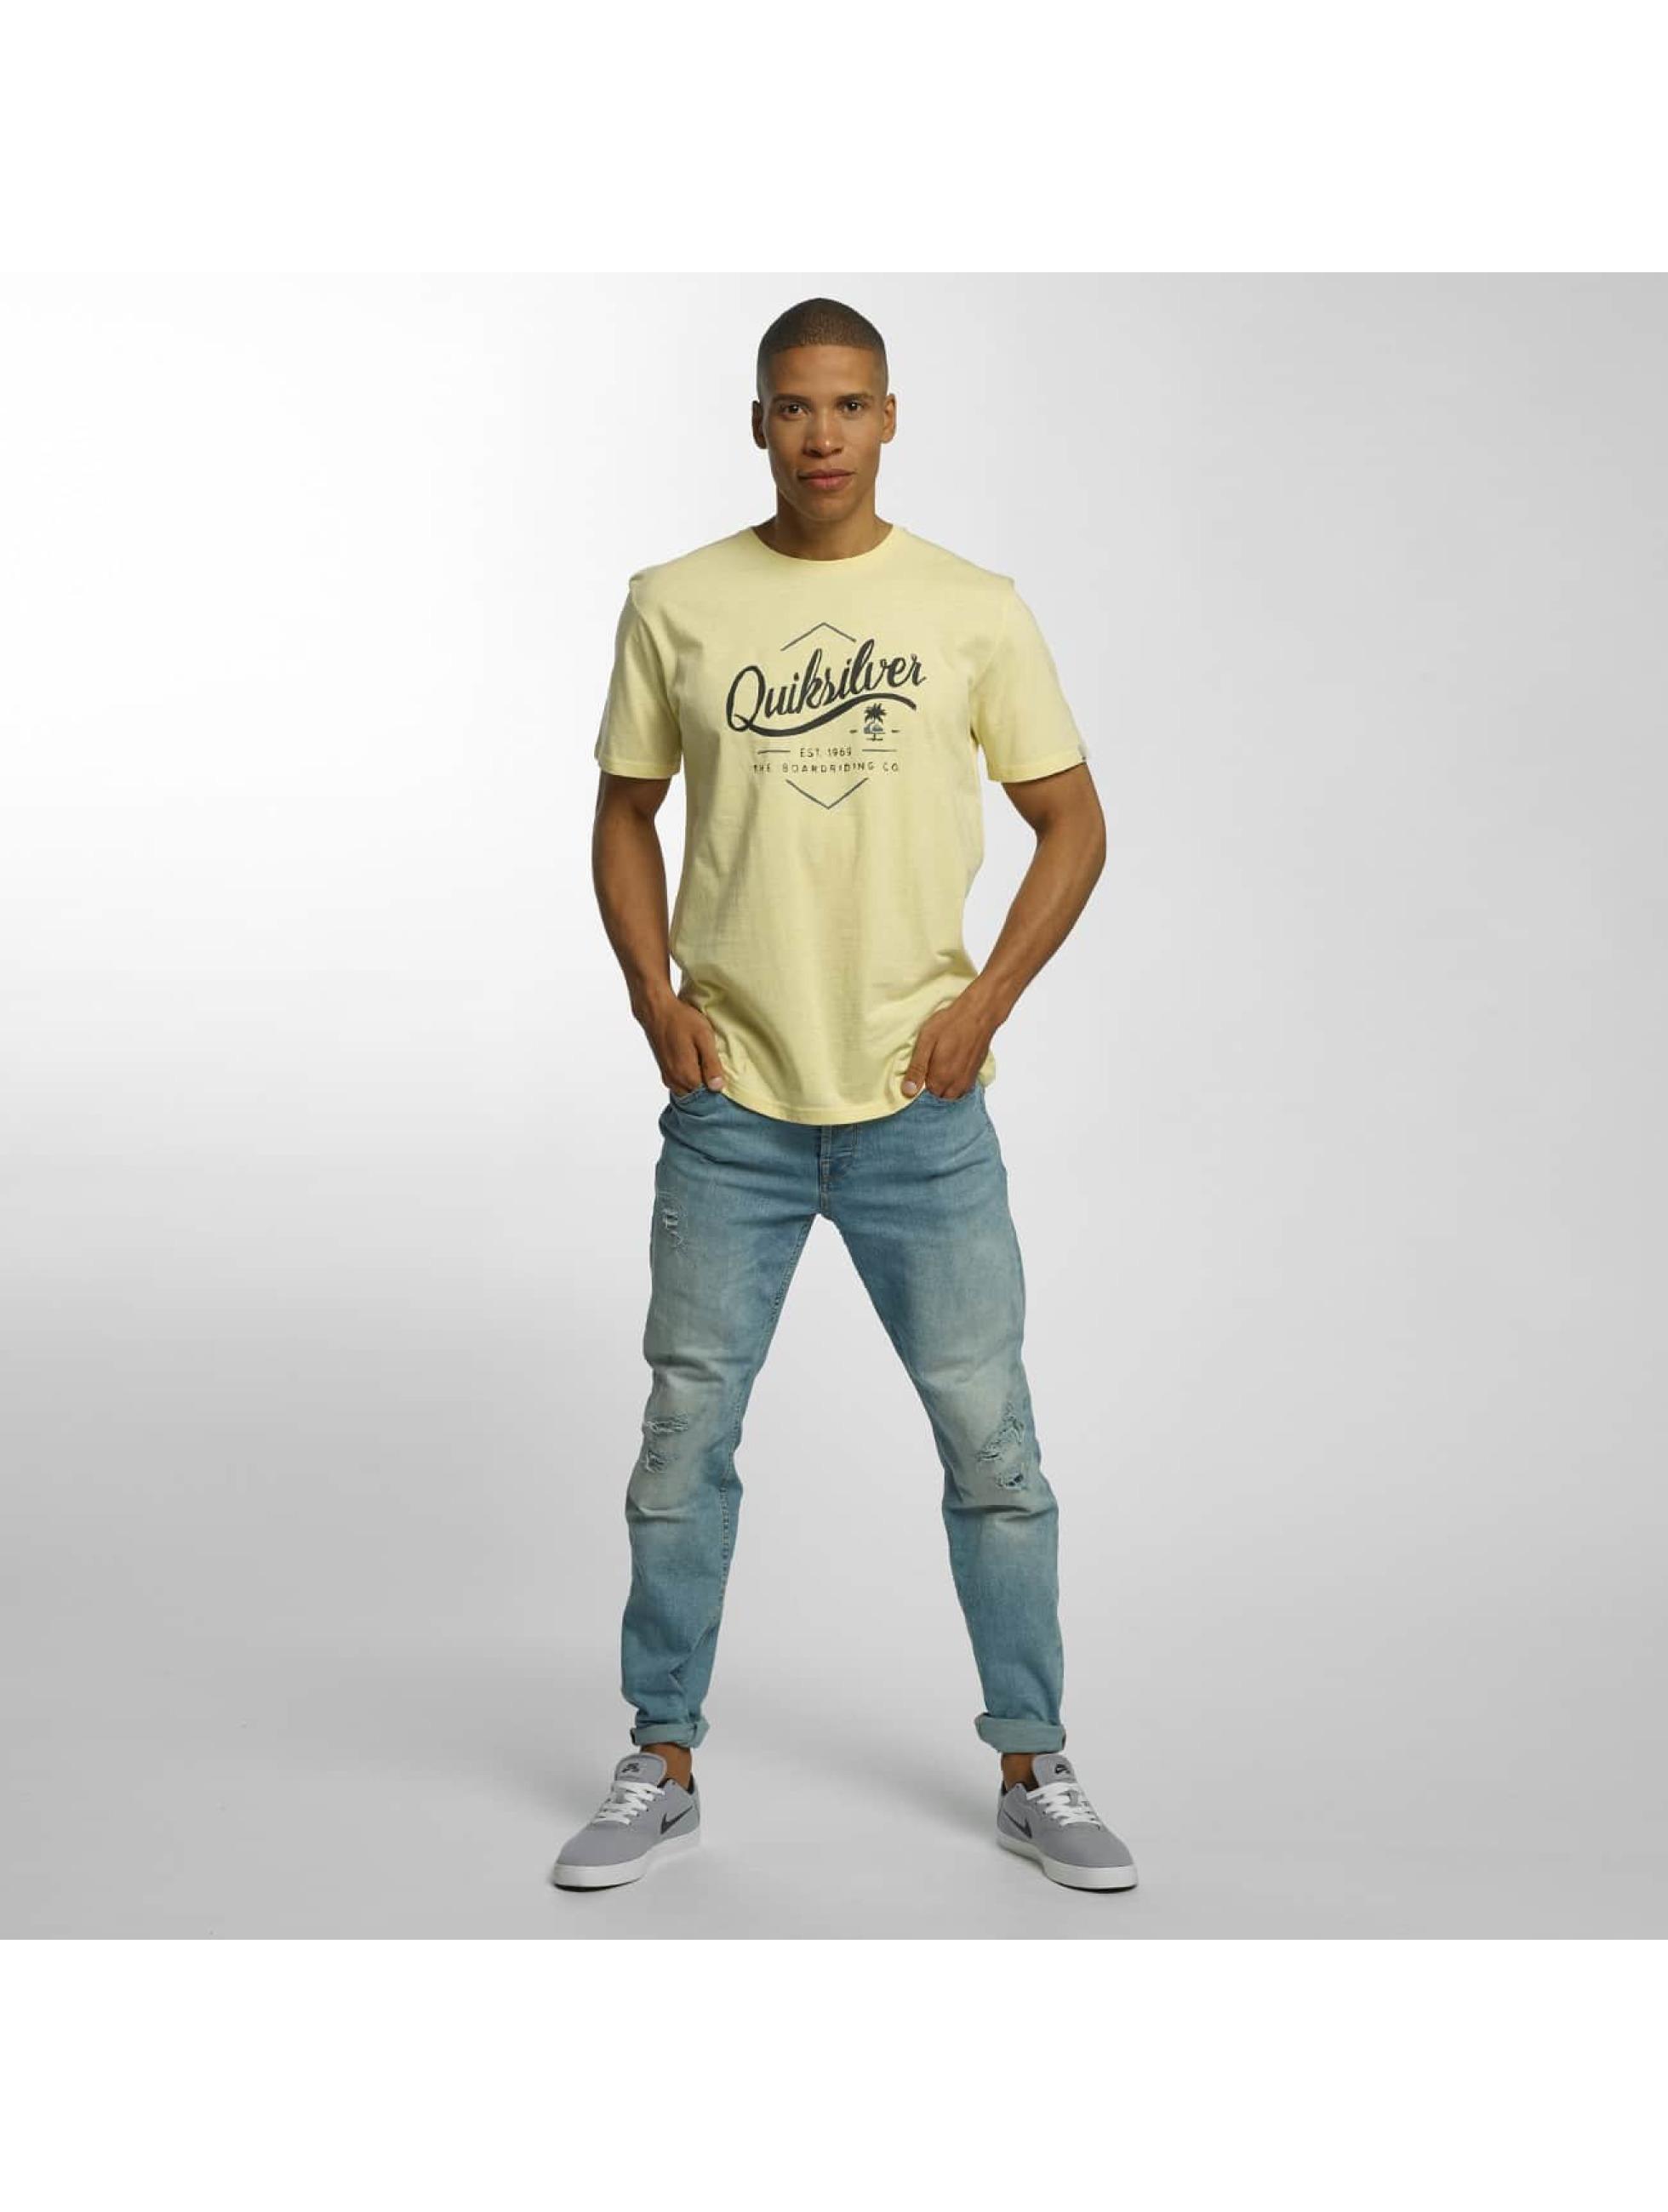 Quiksilver T-shirt Classic Sea Tales giallo